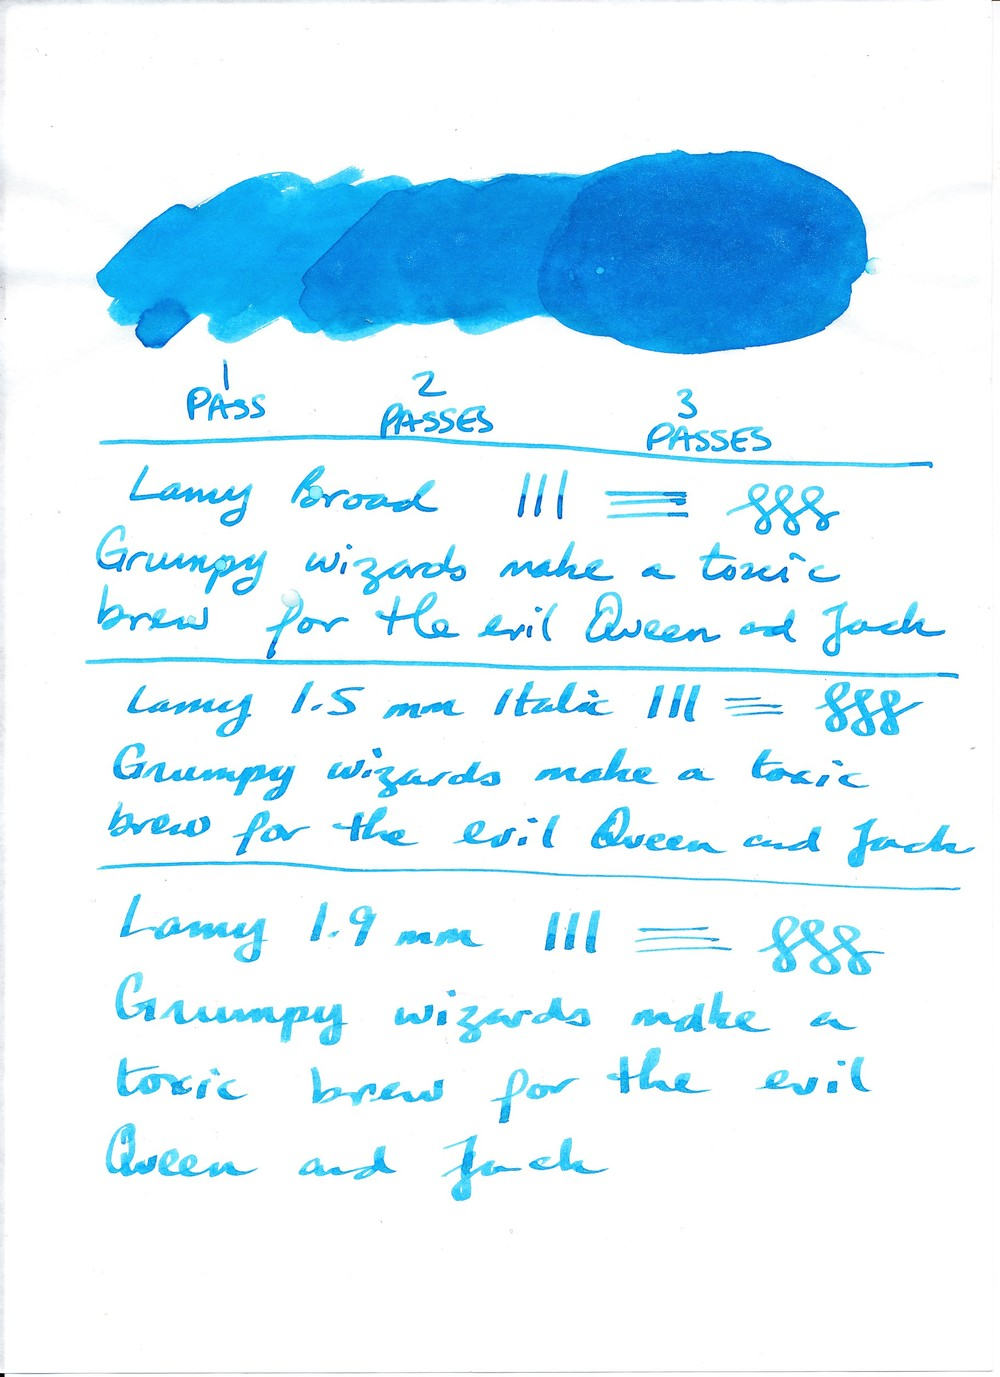 Writing Sample on Tomoe River 52 gsm